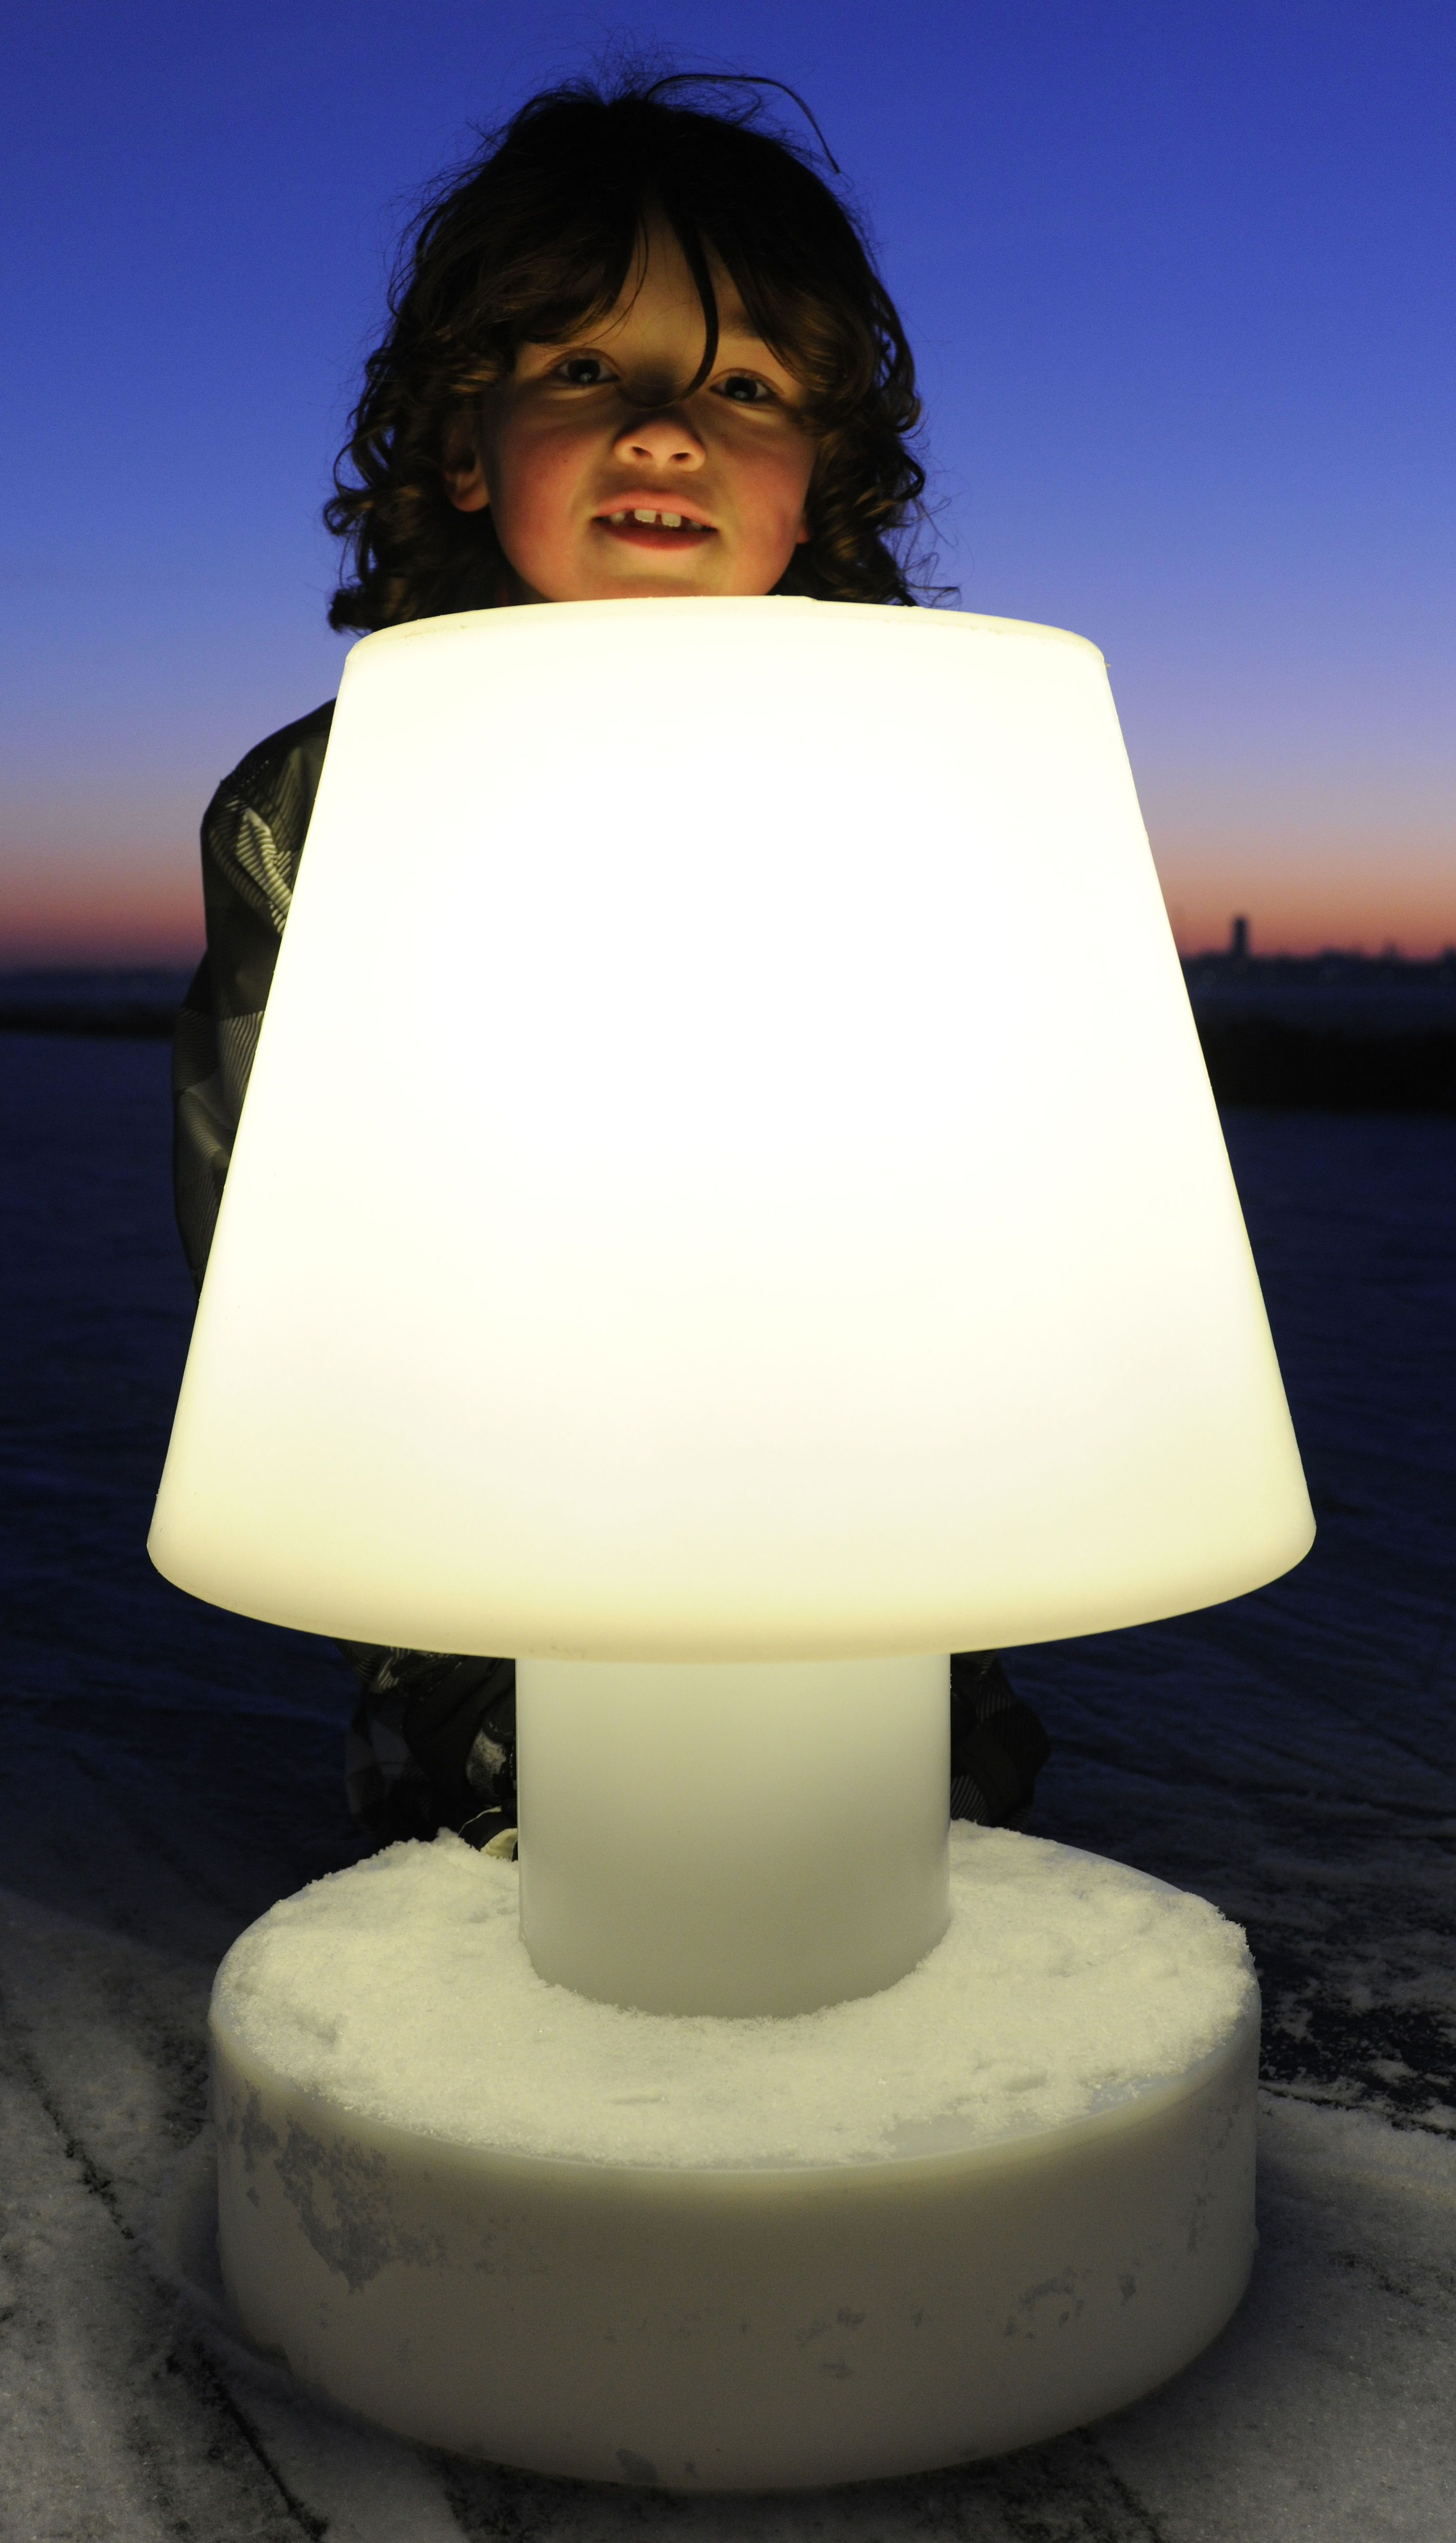 lampe ohne kabel tragbar kabellos mit akku h 40 cm wei h 40 cm by bloom made in design. Black Bedroom Furniture Sets. Home Design Ideas